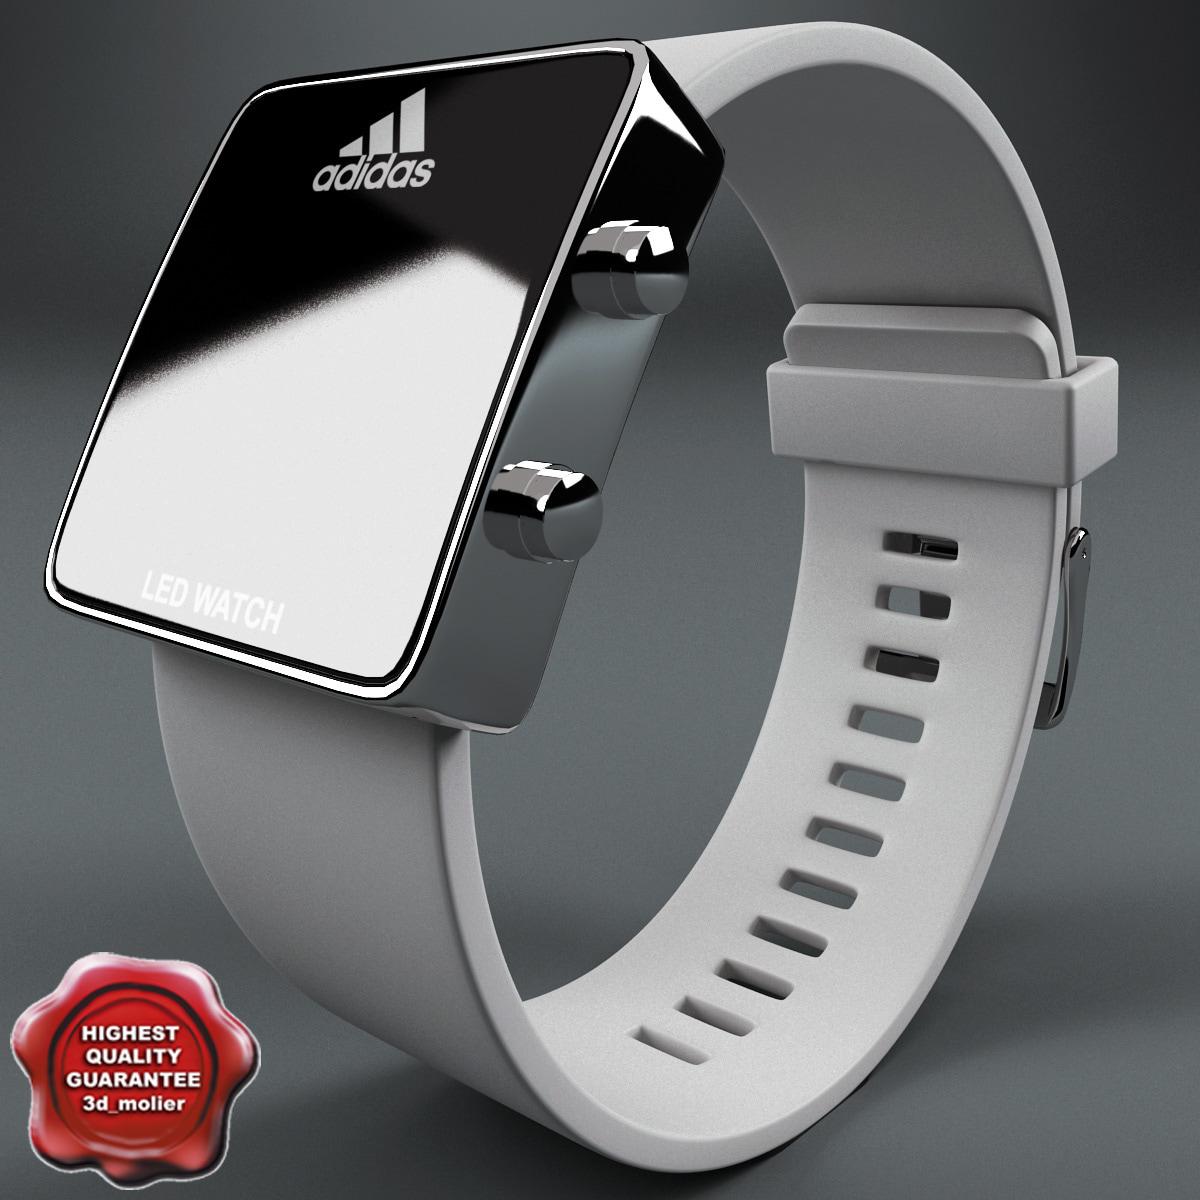 Adidas_LED_Watch_White_00.jpg